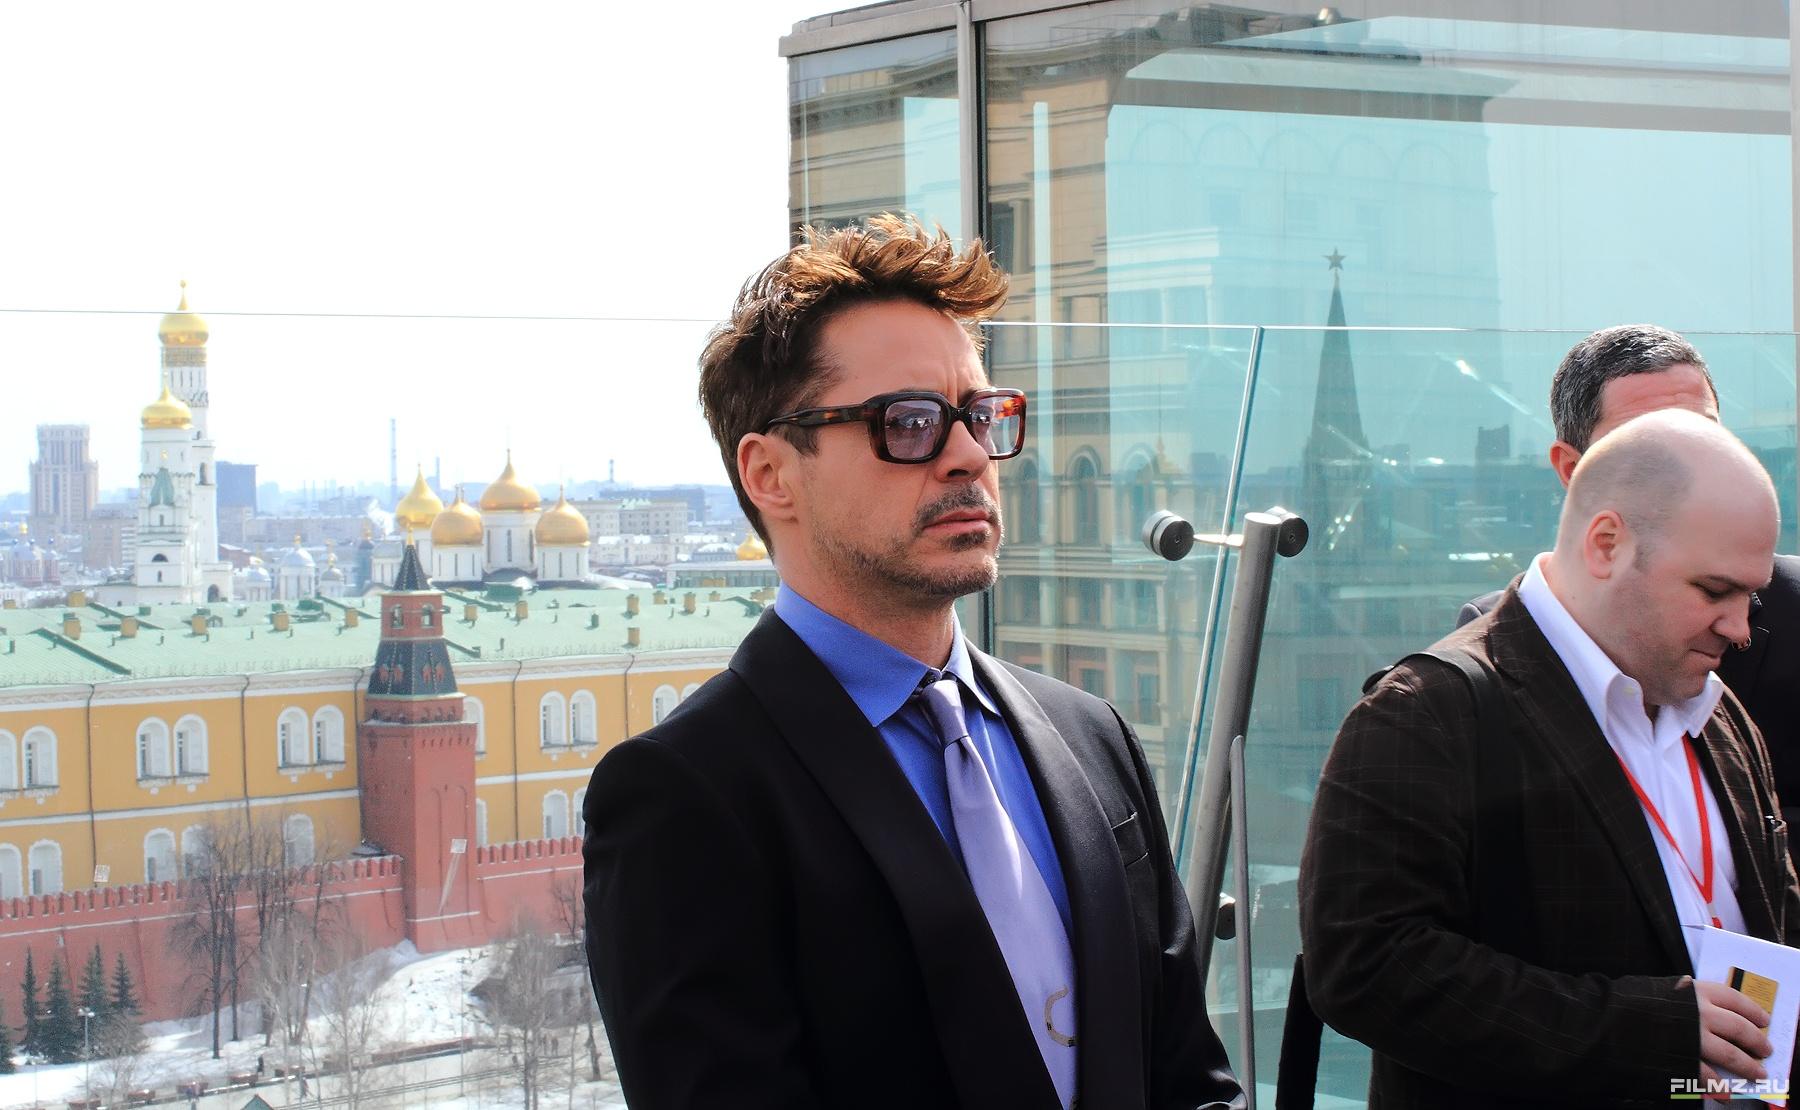 фотосессия Роберт Дауни-мл. и Бен Кингсли в Москве Роберт Дауни-мл.,